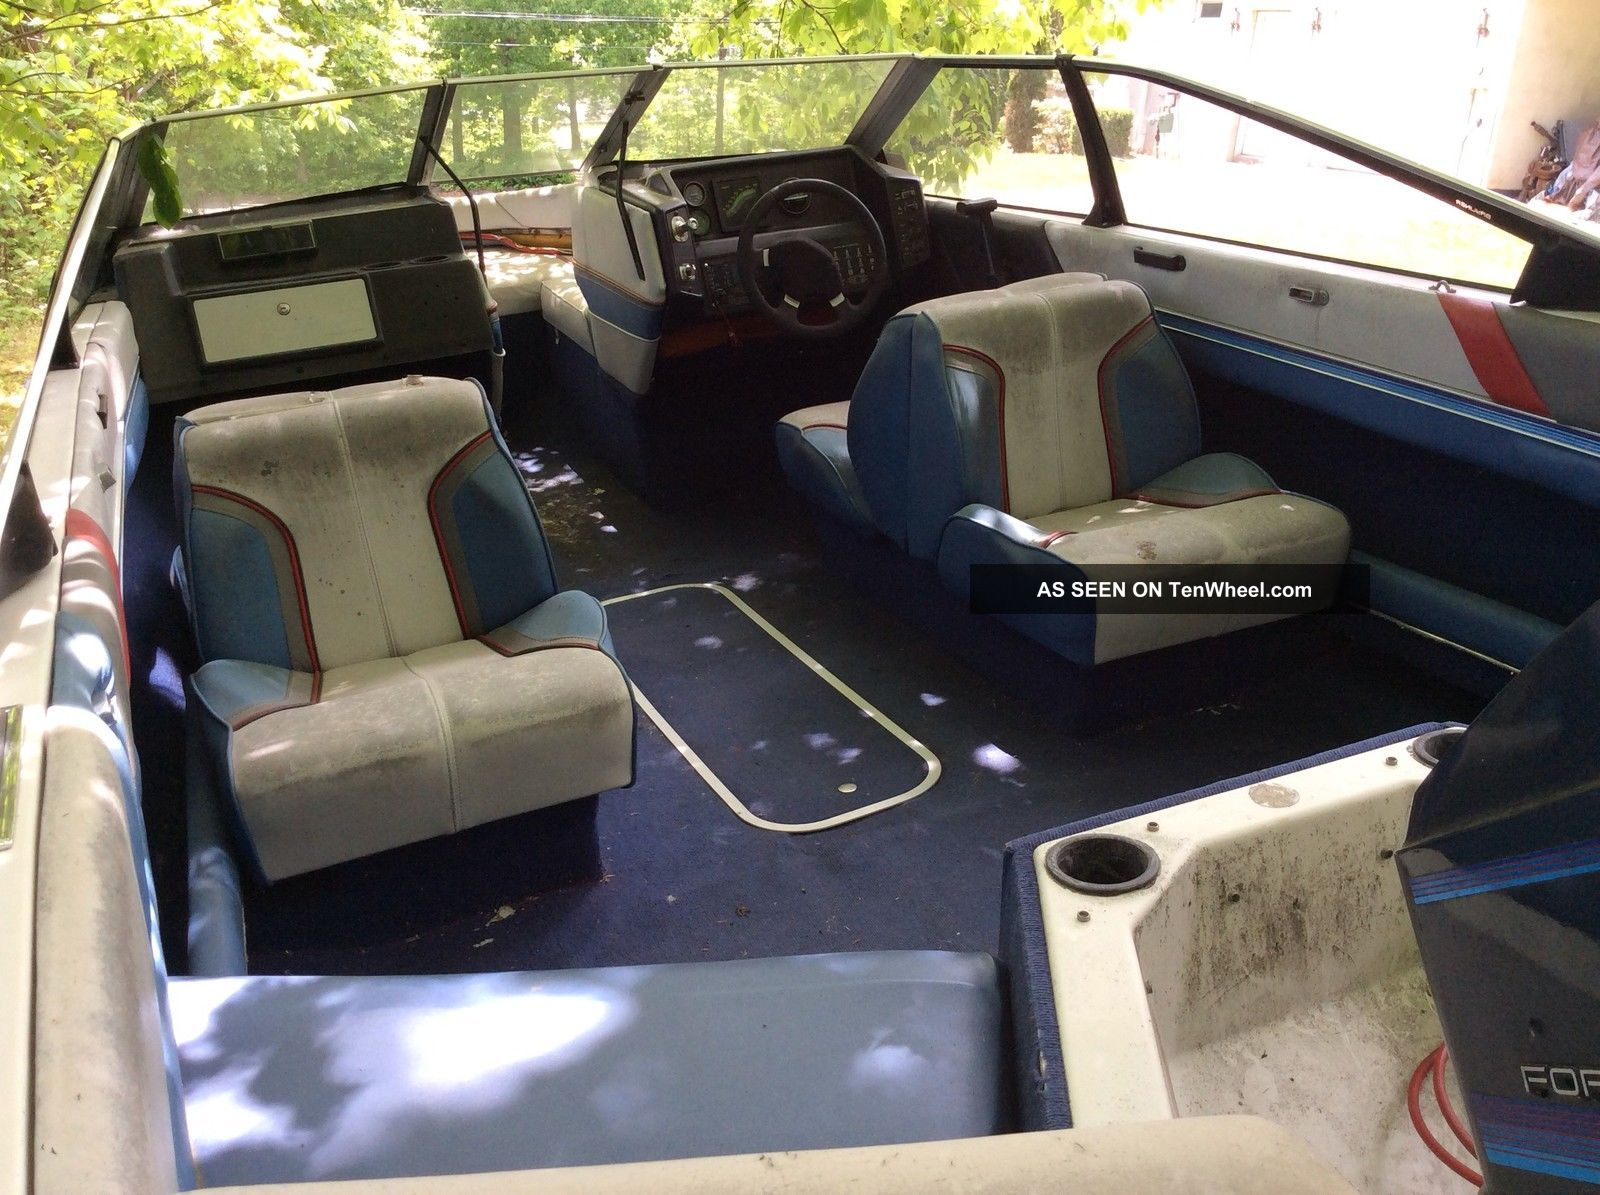 1987 Bayliner Capri Seat Covers